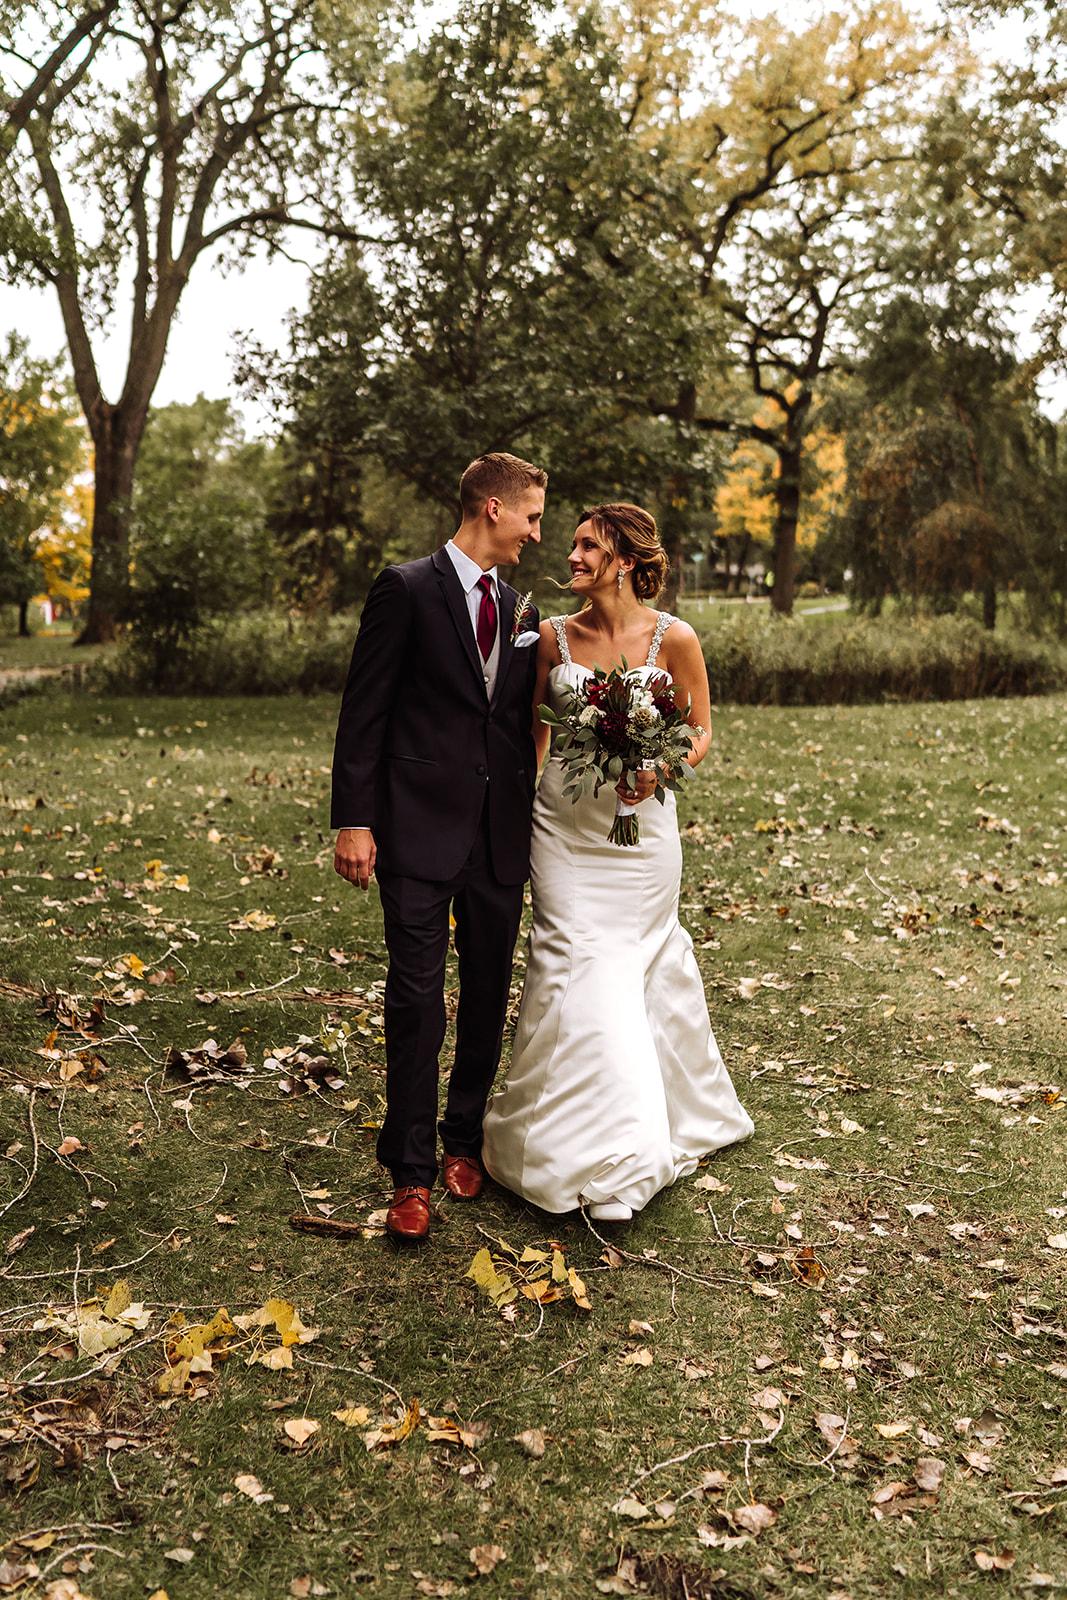 Scott and Andrea Wedding 2018-714.jpg